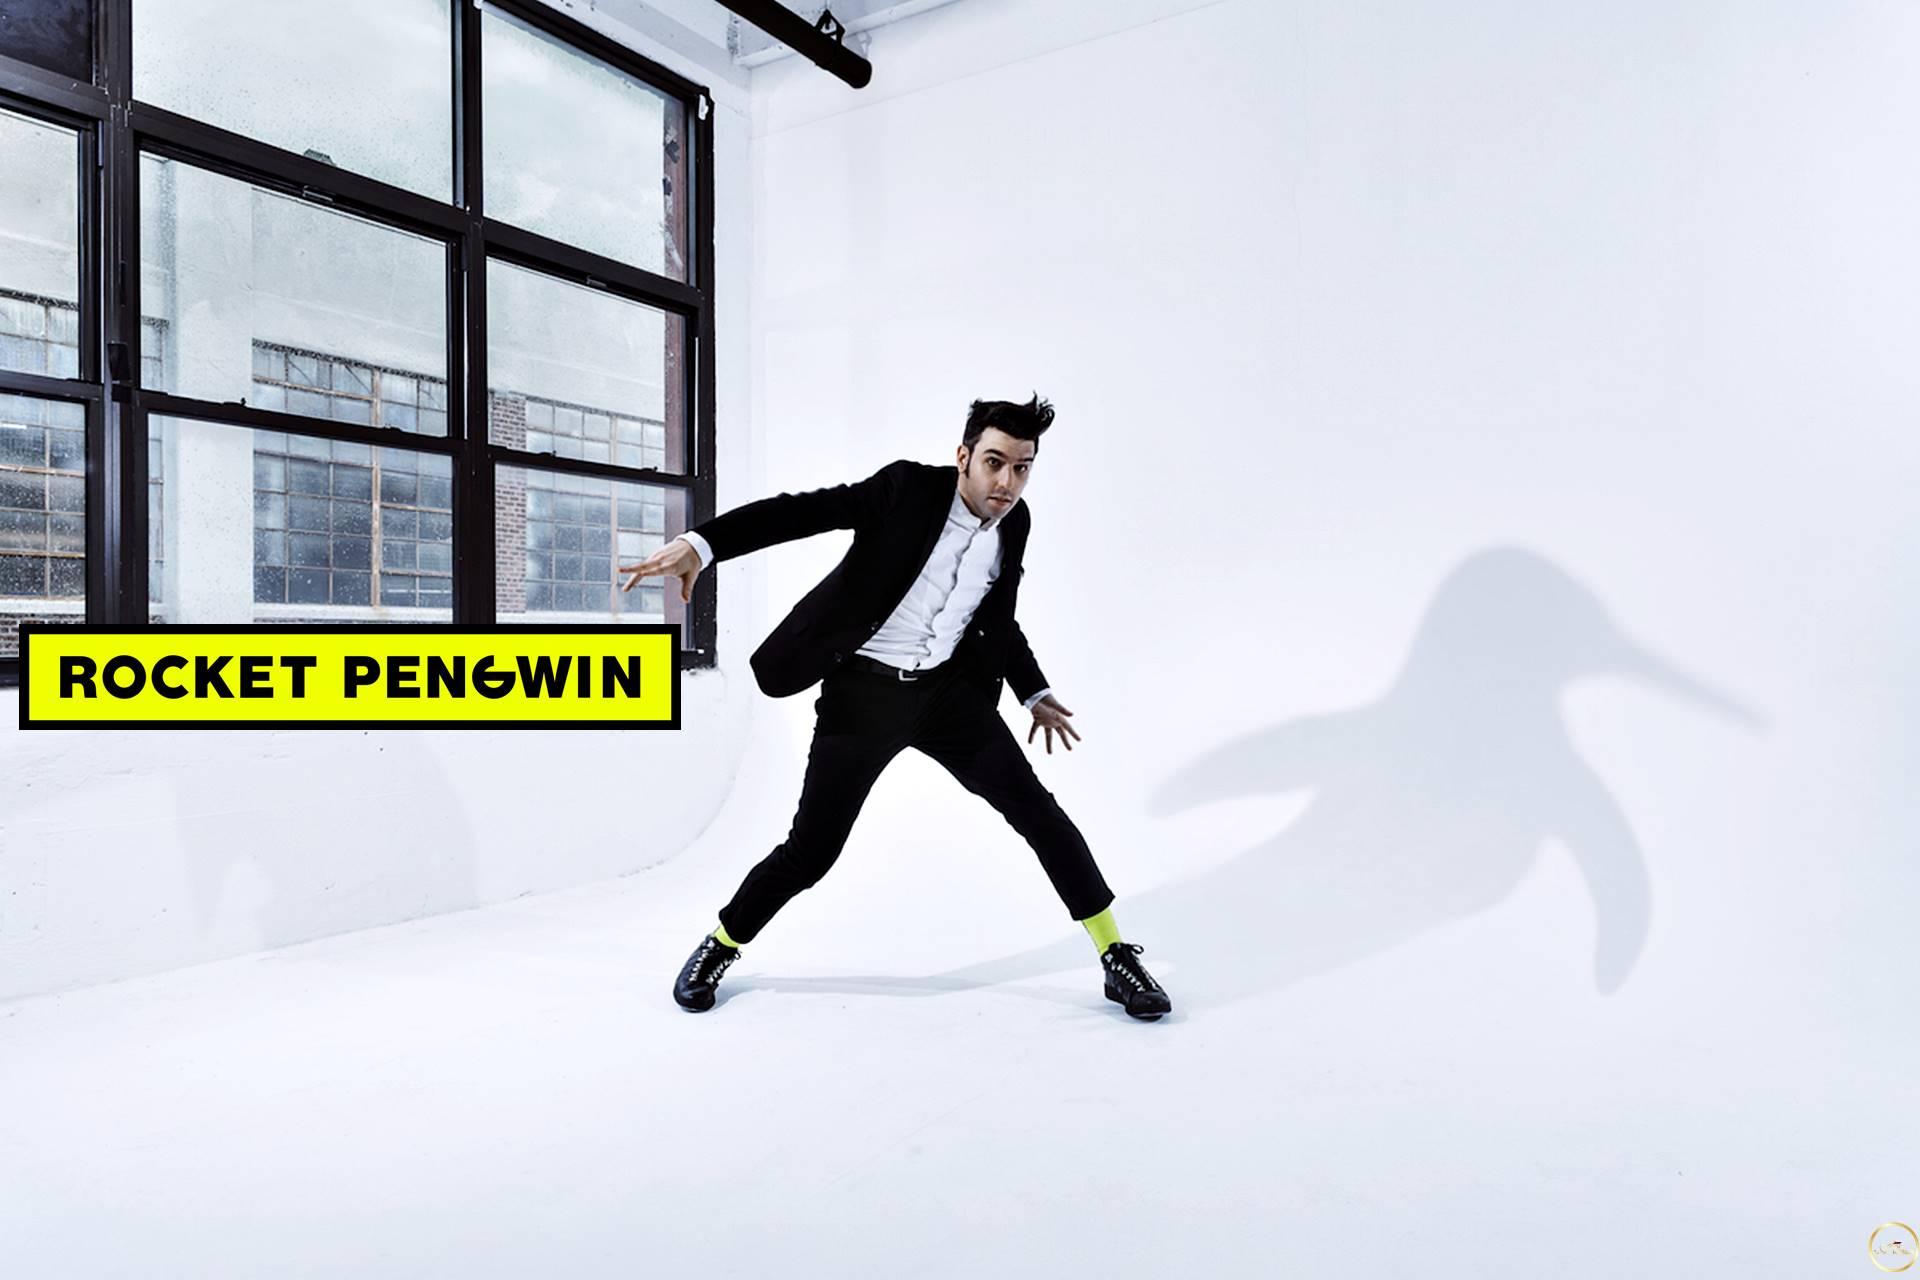 Rocket Pengwin